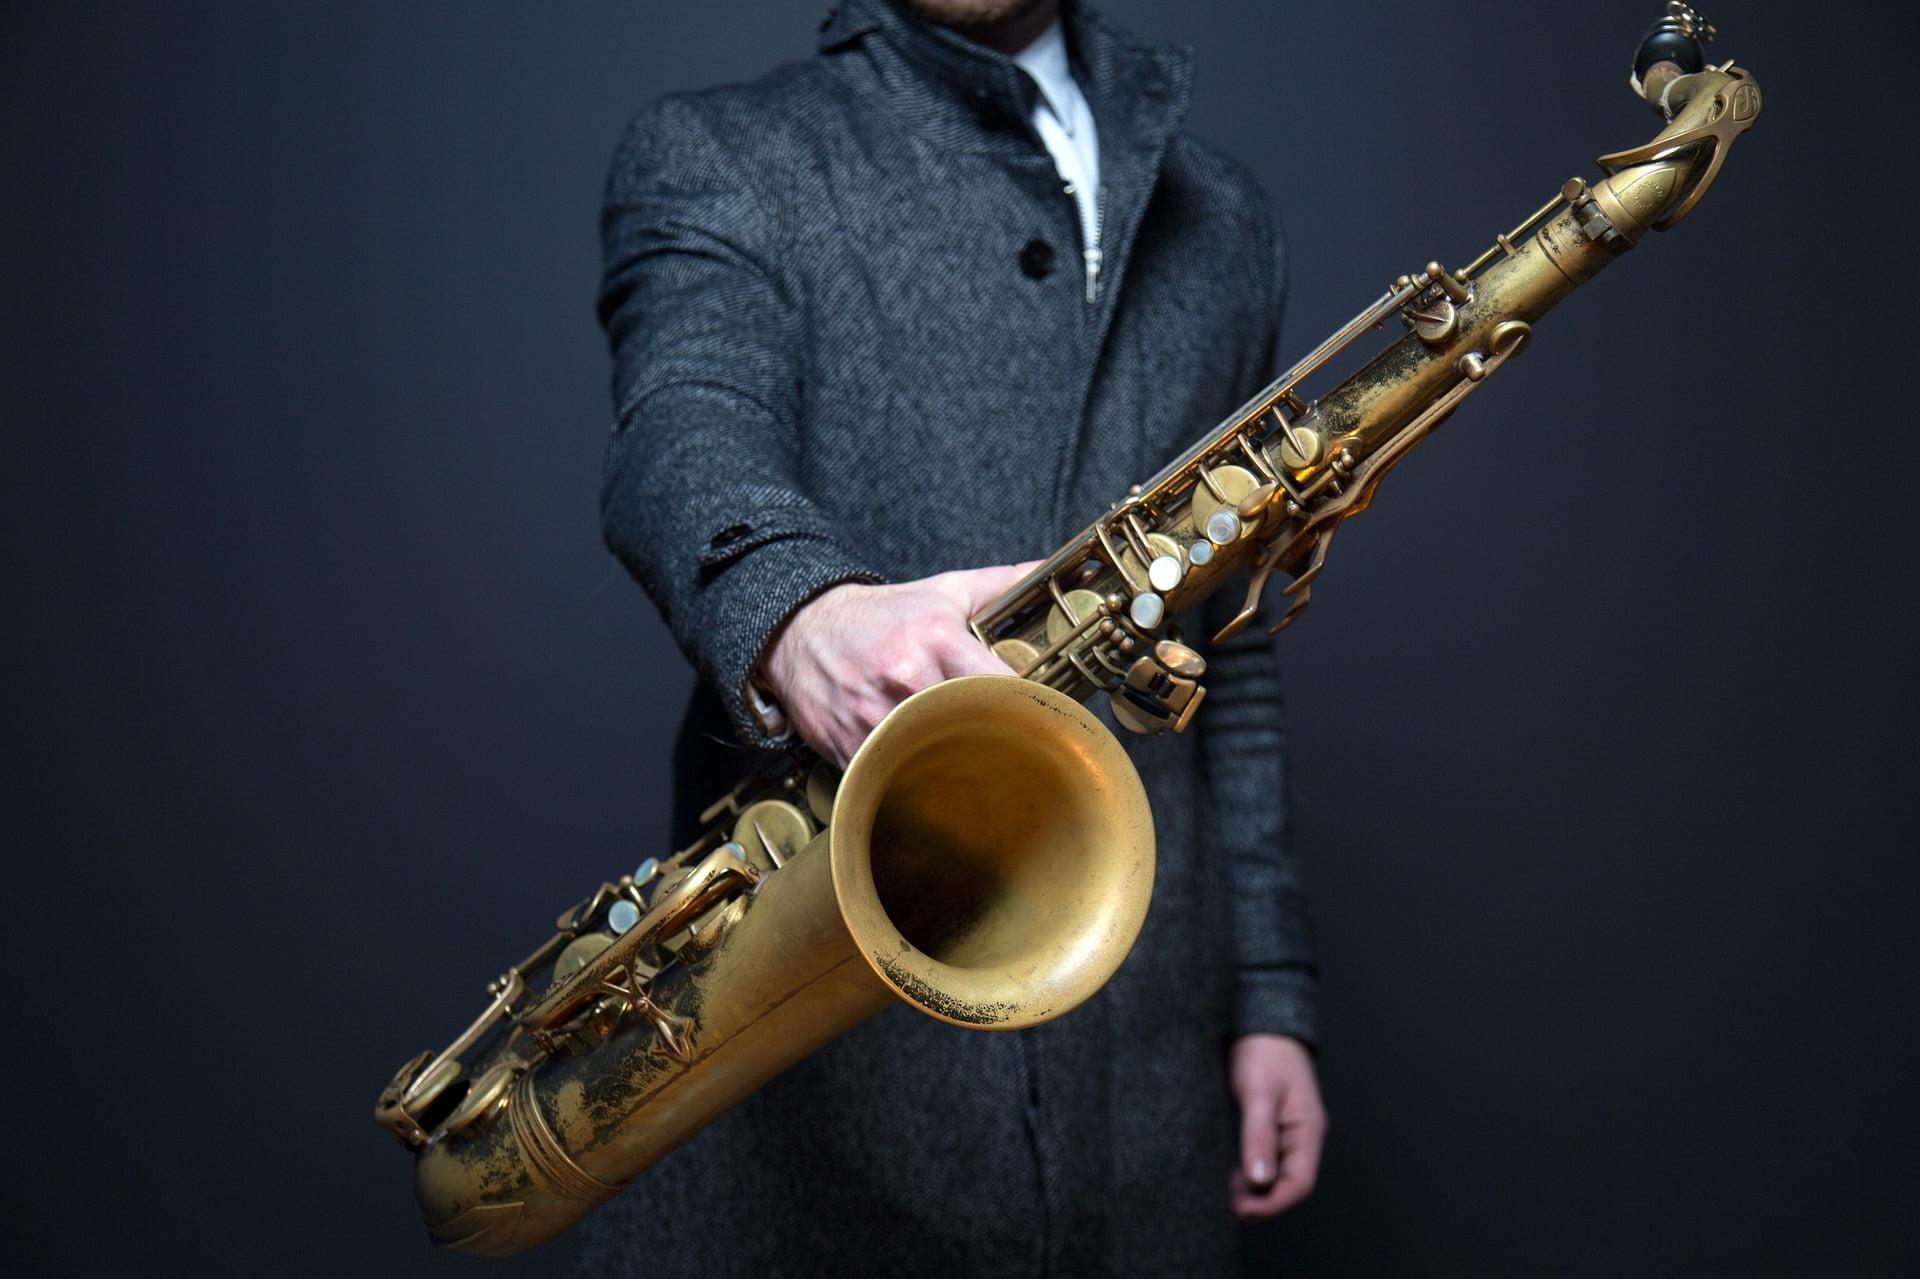 Sax Player Essex